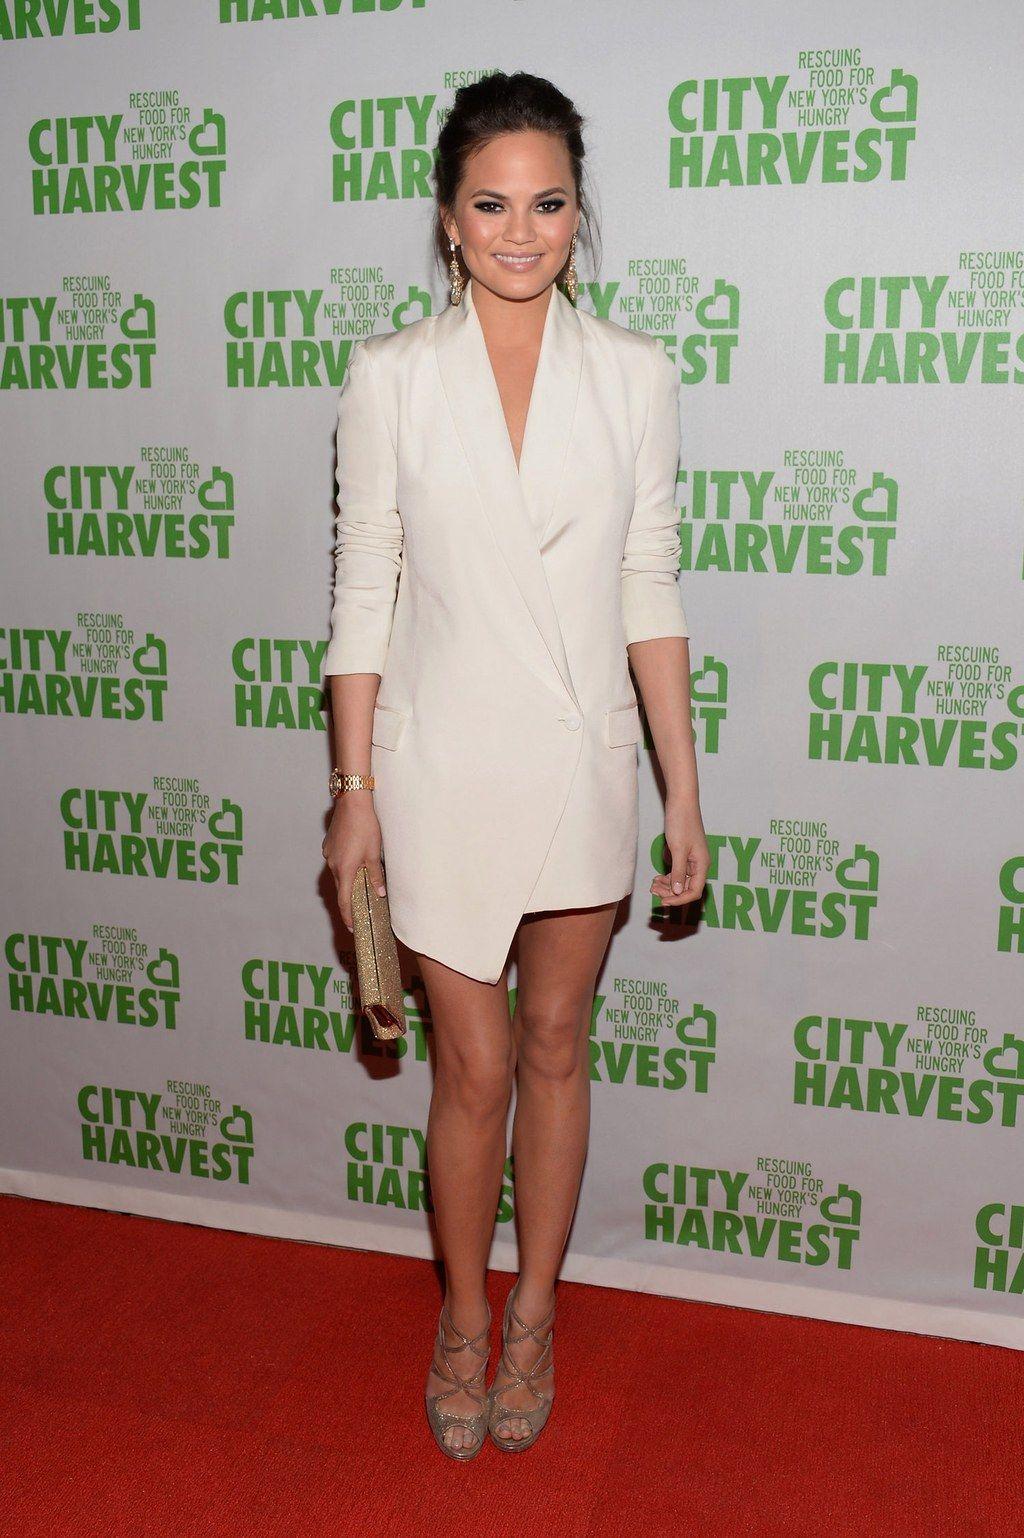 Glamour Style Icon Chrissy Teigen Has Enviable Summer Style Get Inspired Tuxedo Dress Fashion Little White Dresses [ 1538 x 1024 Pixel ]